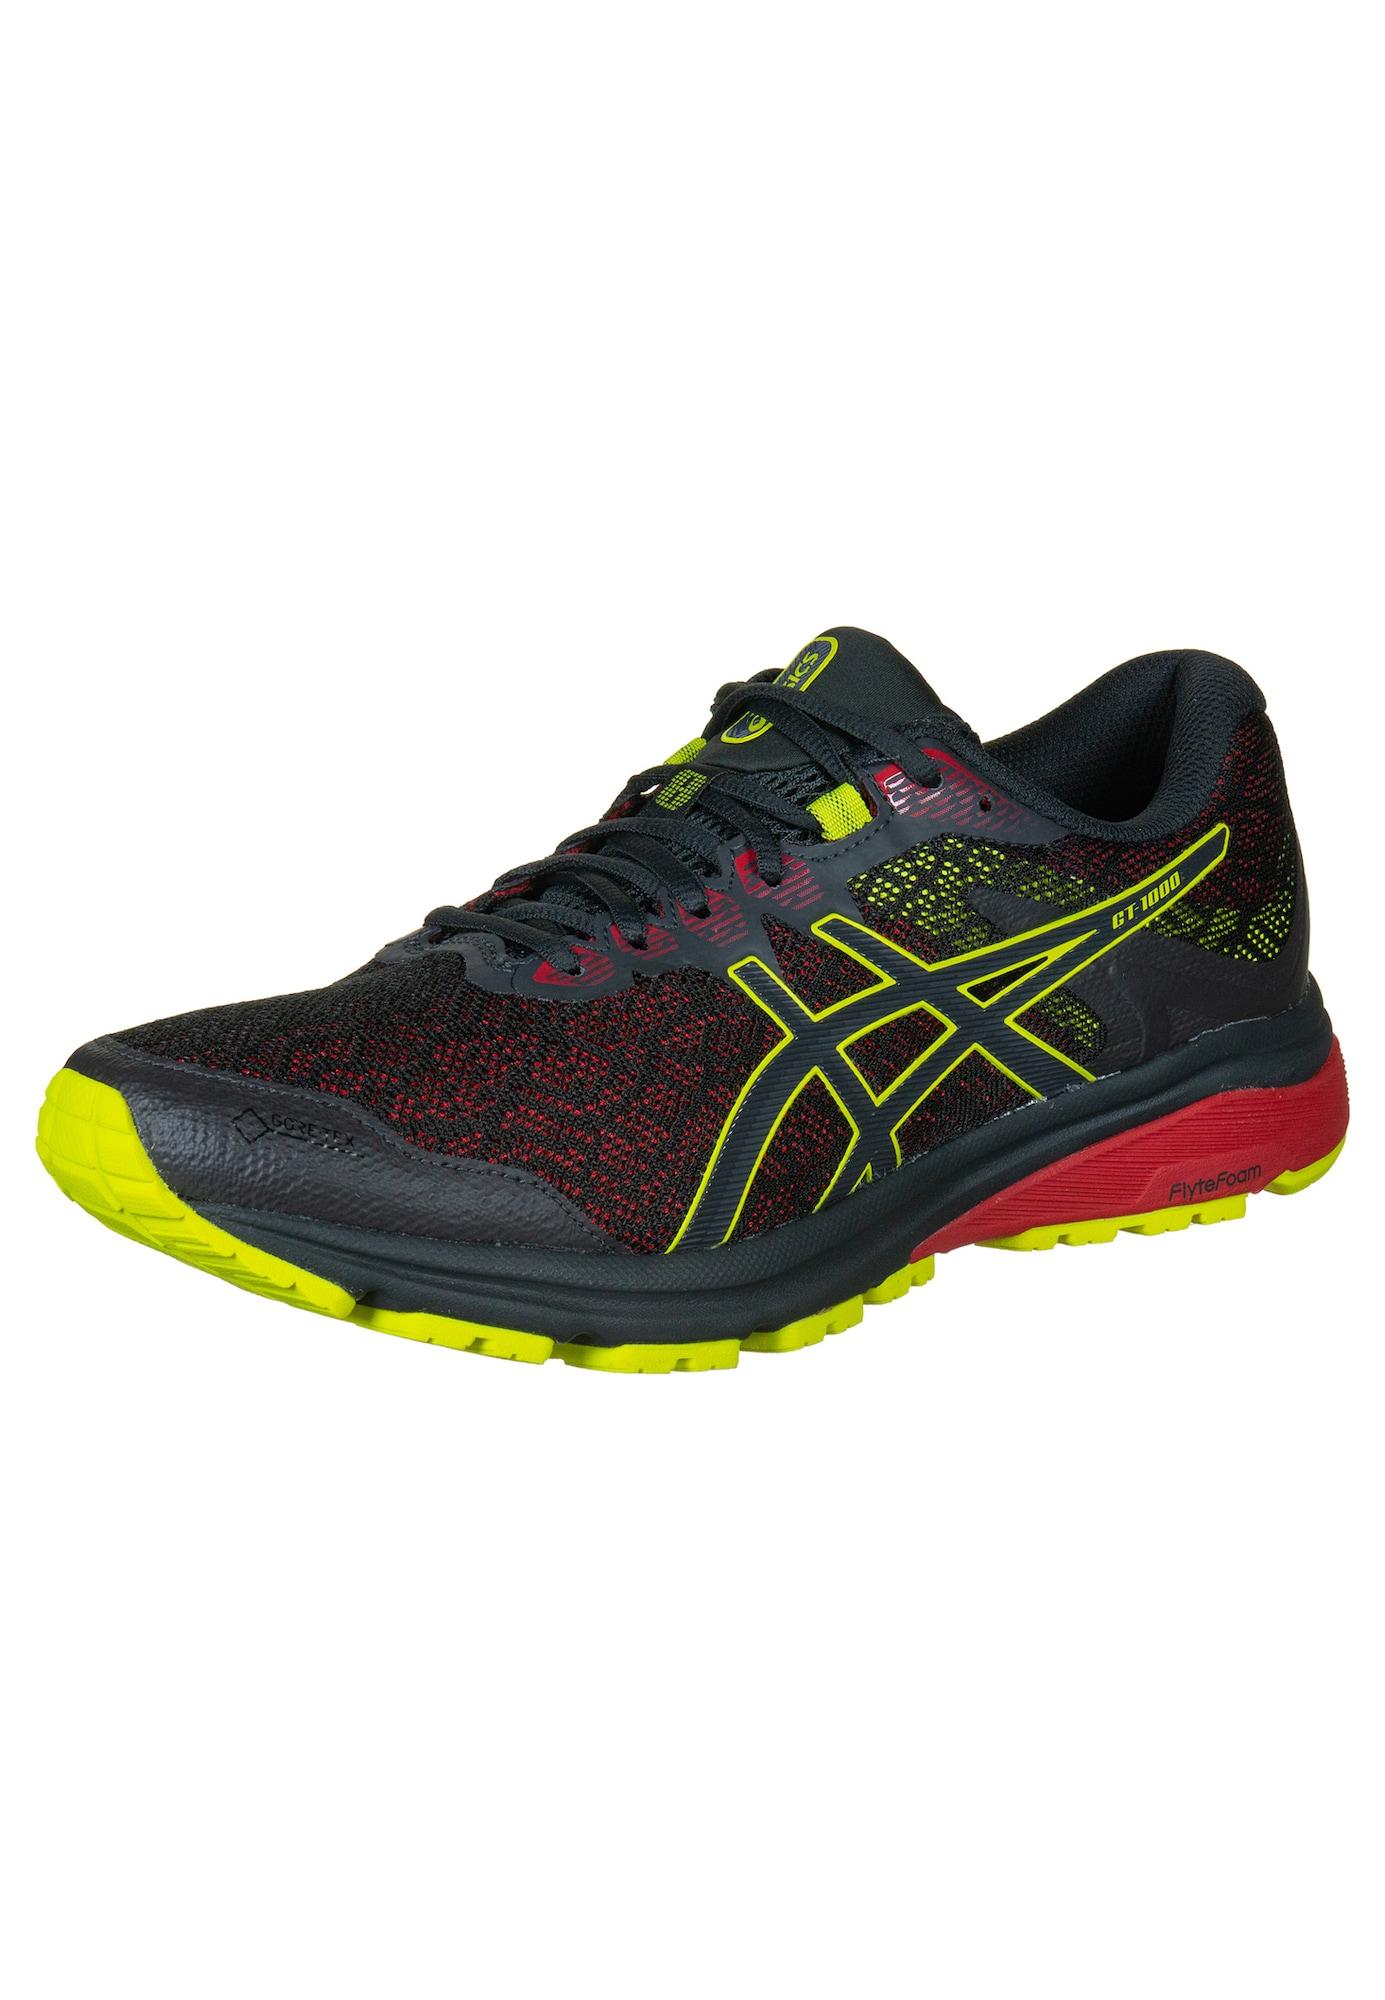 ASICS Bėgimo batai 'GT-1000 8 GT-X' geltona / raudona / juoda